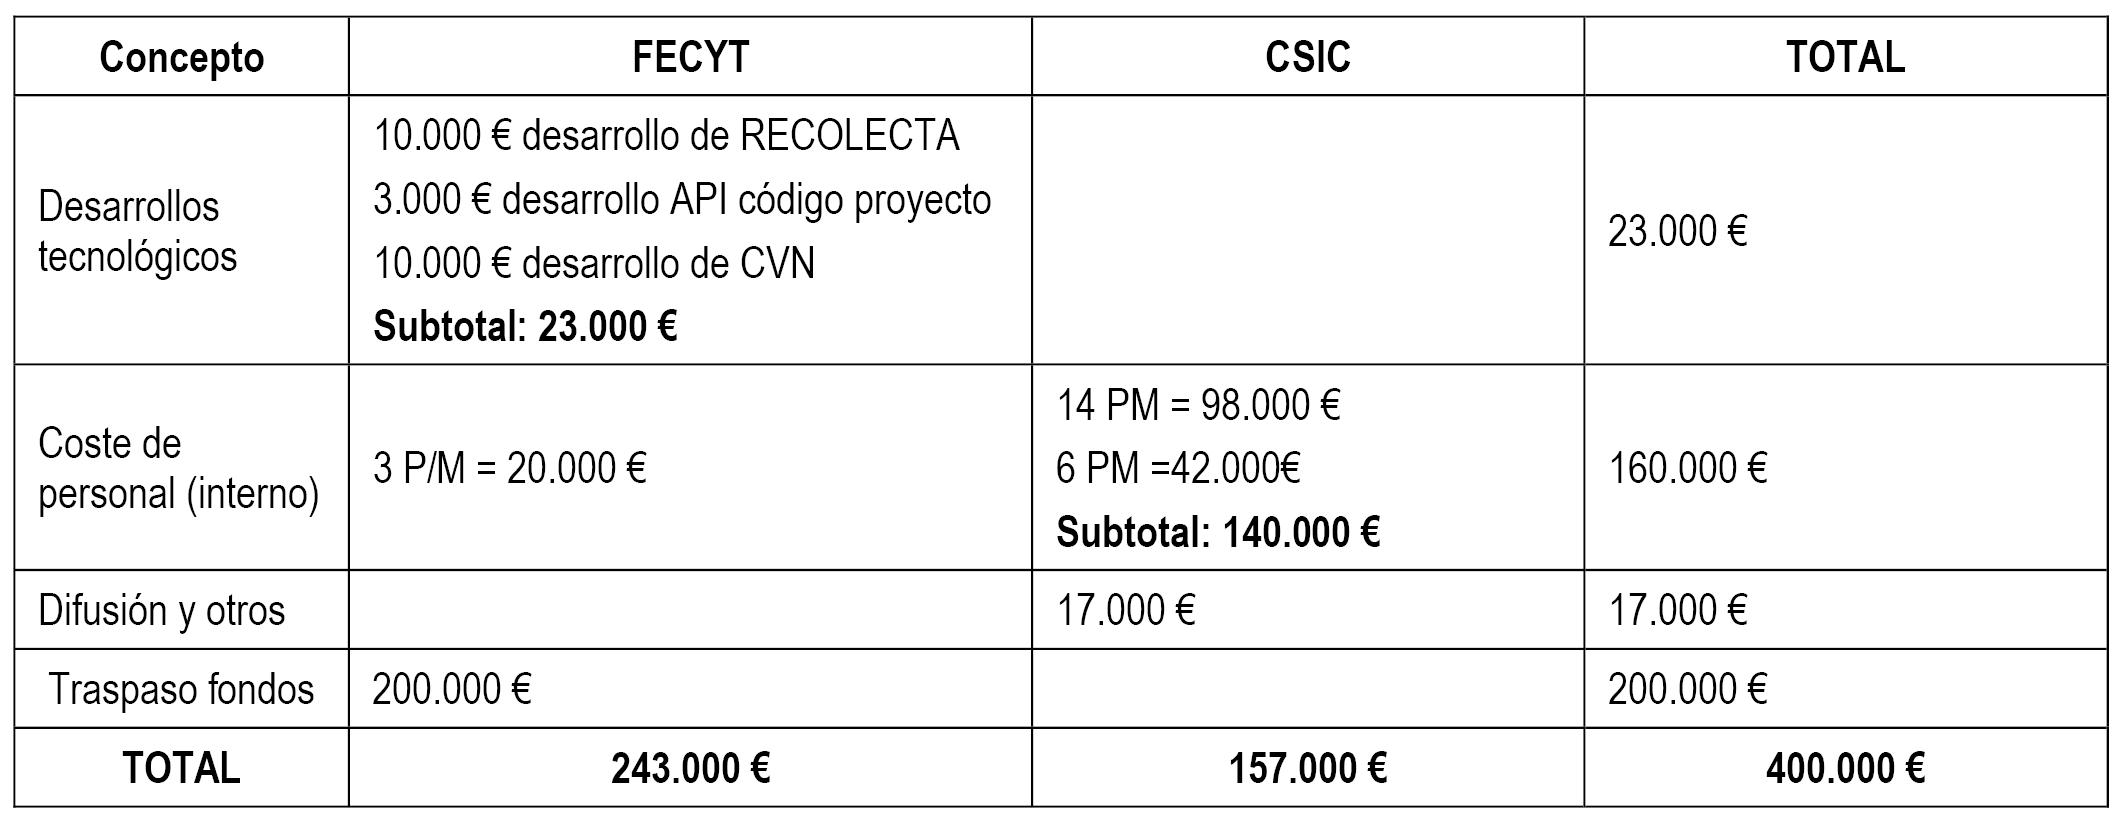 Boe Es Documento Boe A 2018 12688